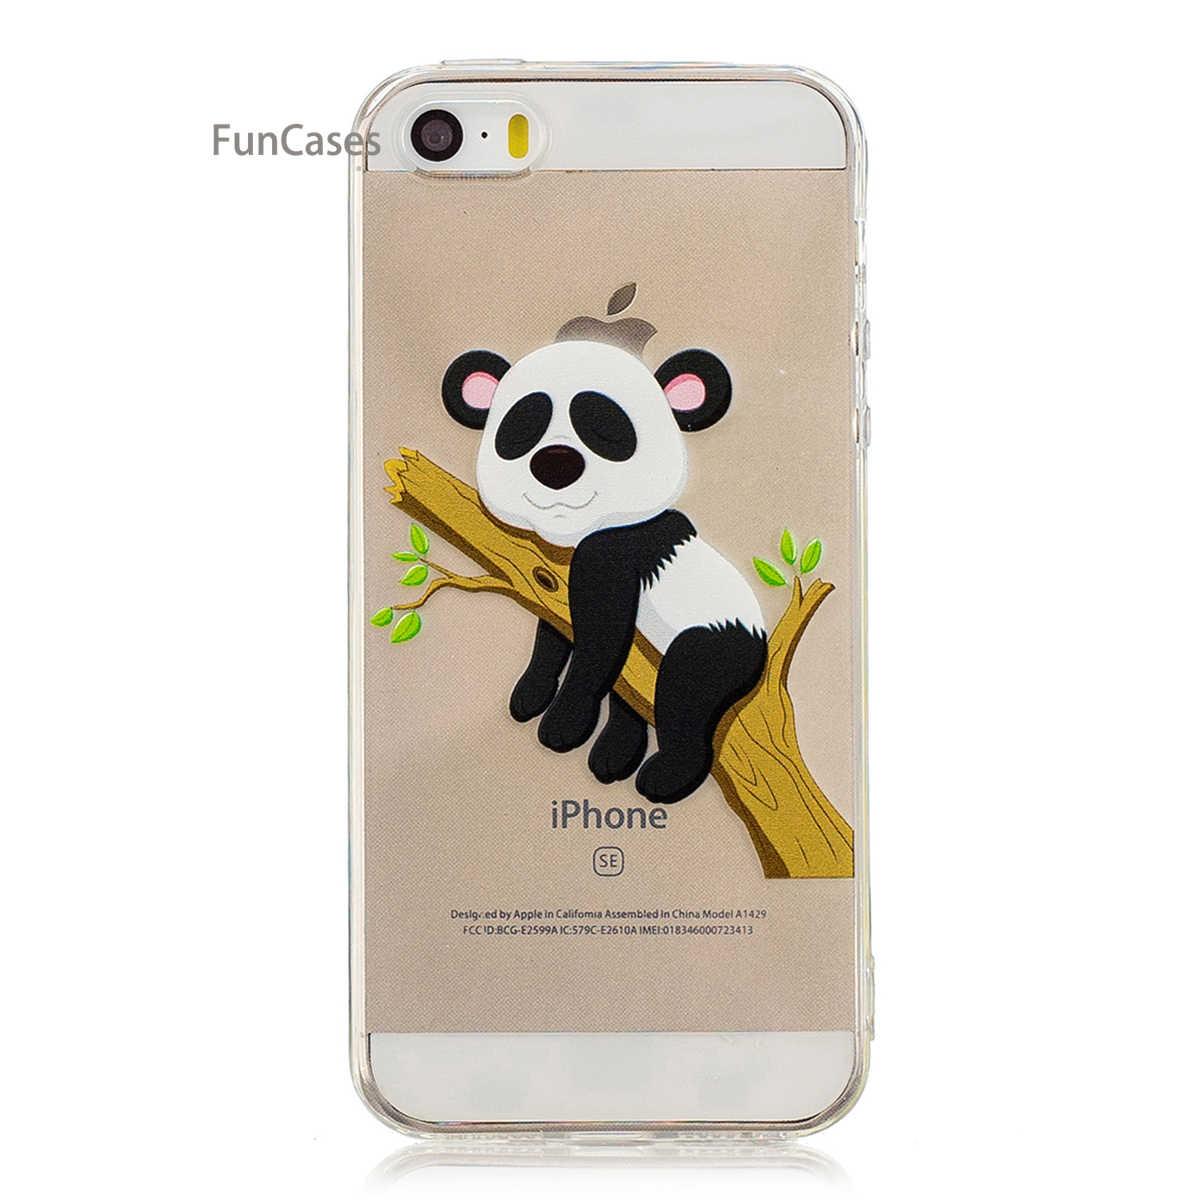 Funda de teléfono Panda encantadora sFor Etui iPhone 5 funda trasera de silicona suave Capa cubierta trasera abstracta para iPhone 5S SE 5C móvil Telefoan